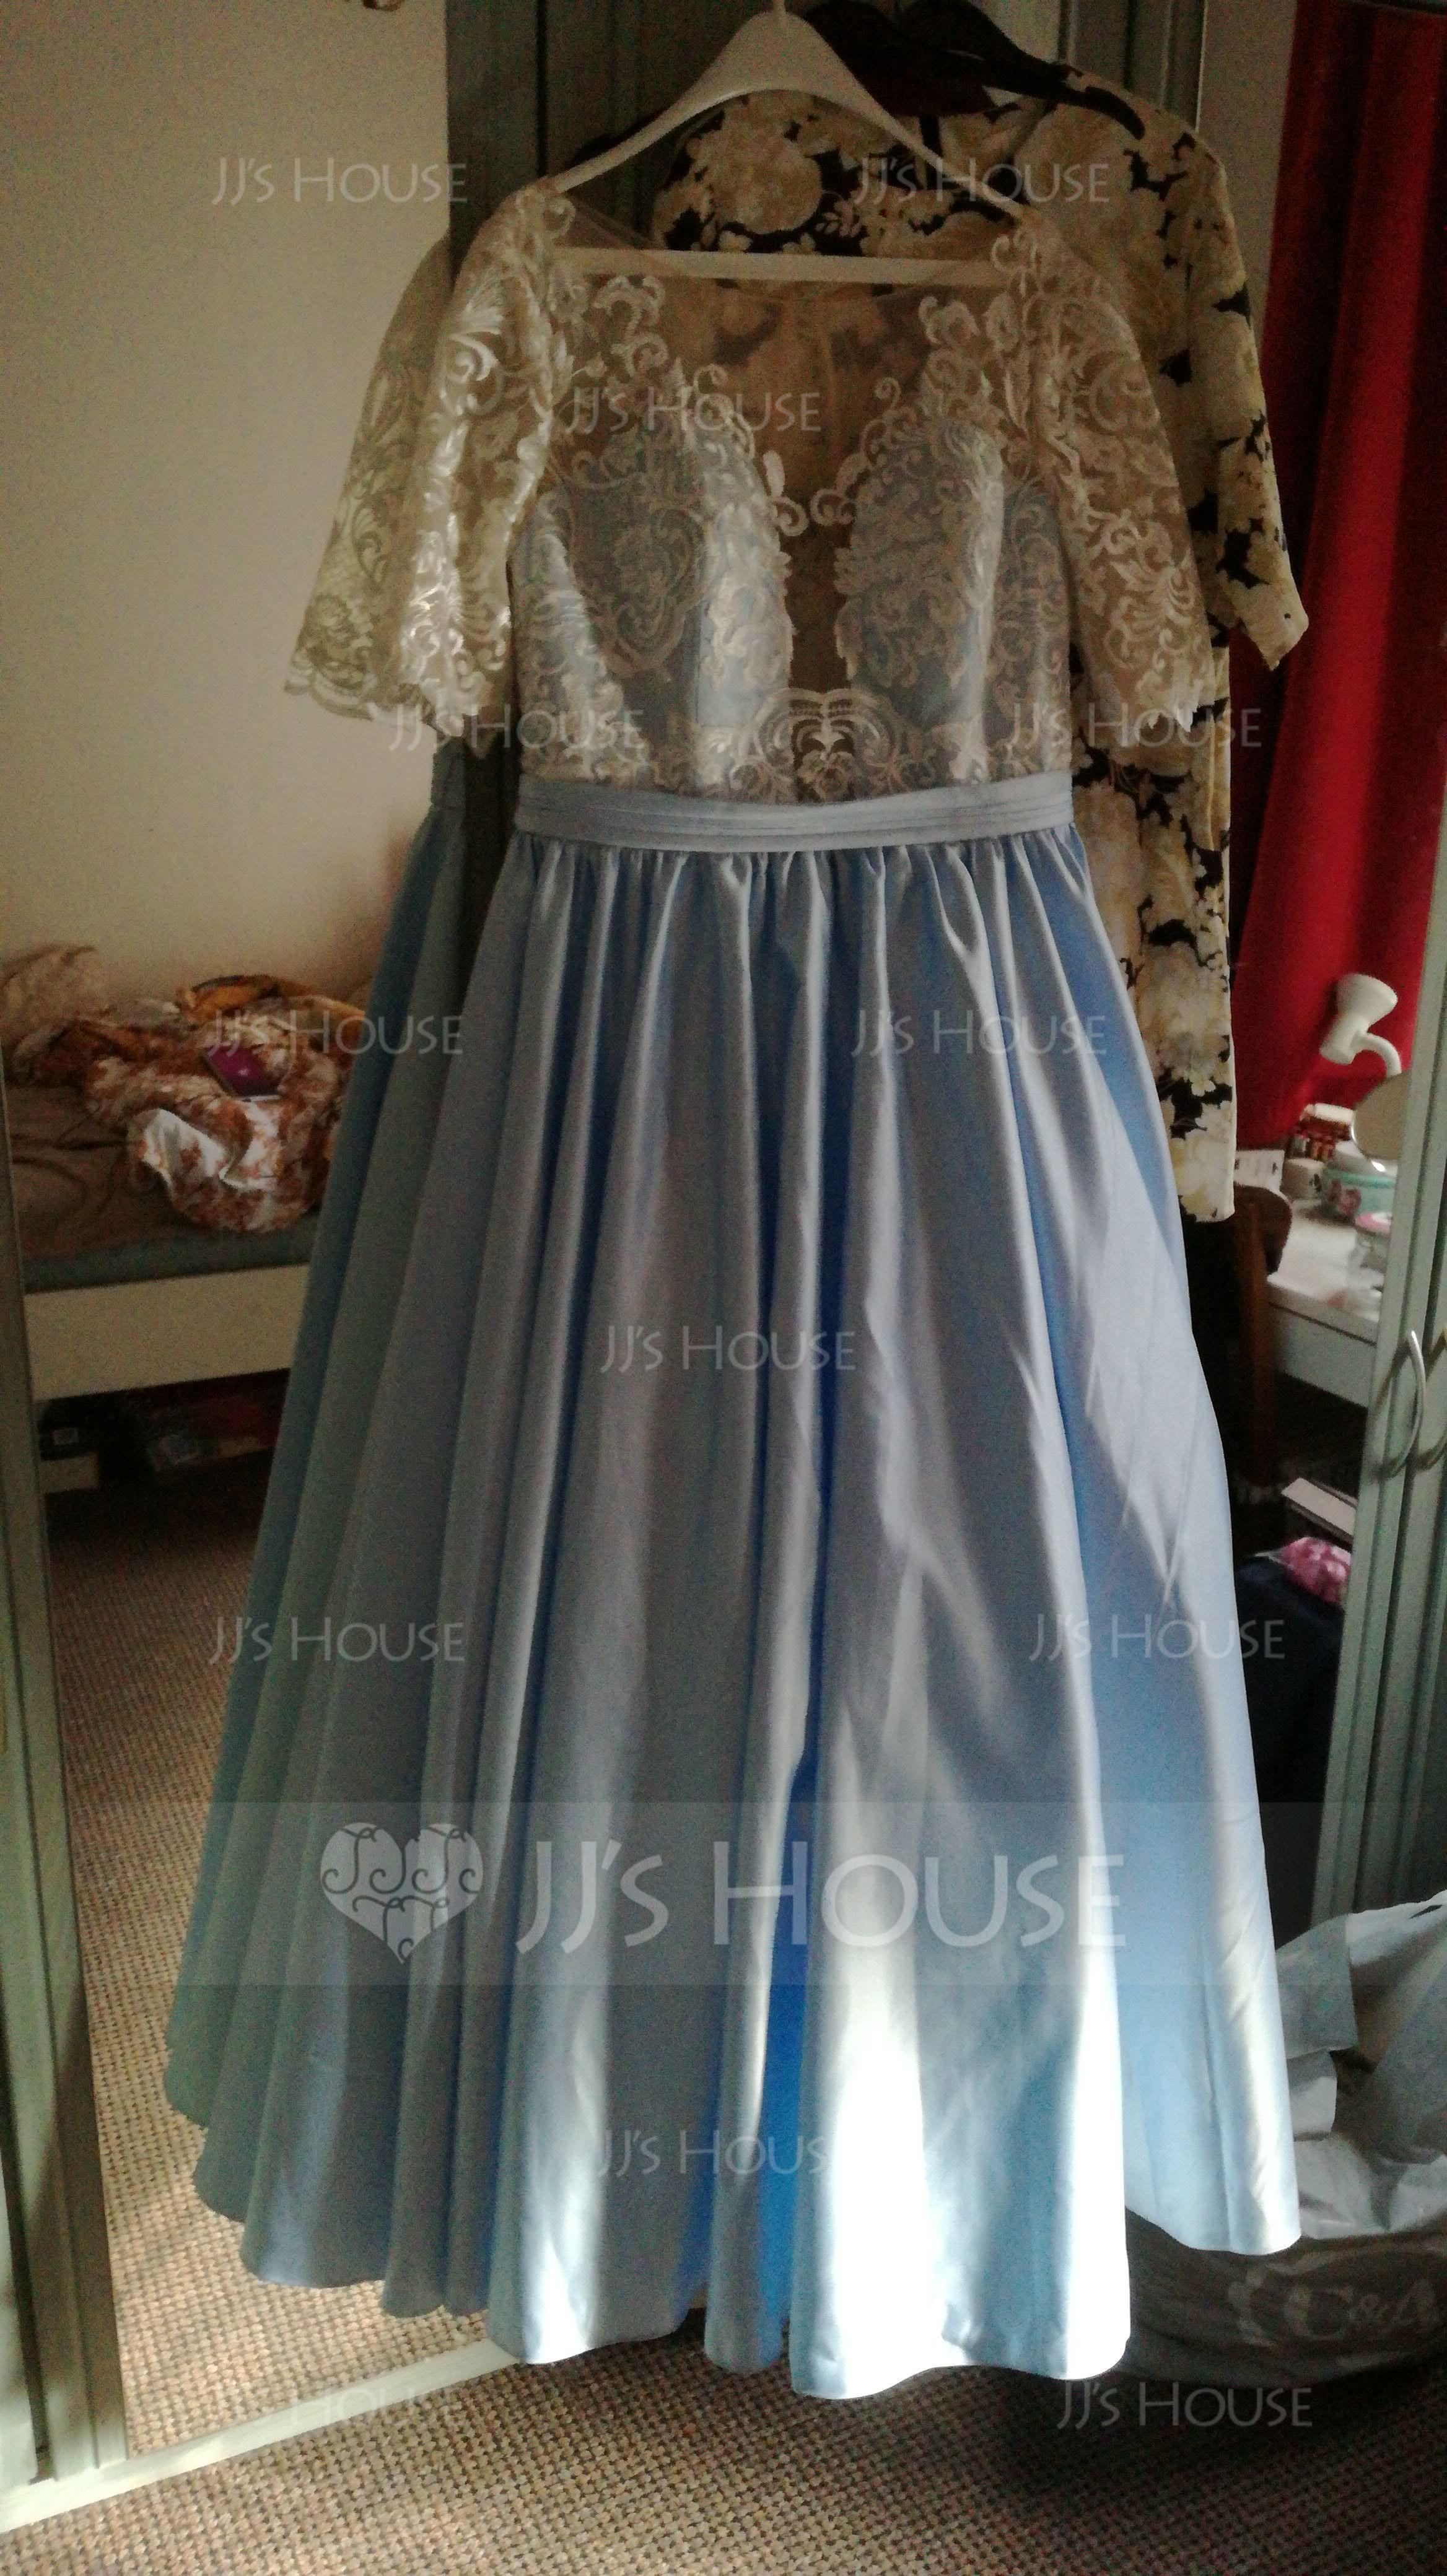 Ball-Gown/Princess Scoop Neck Floor-Length Satin Prom Dresses (018138359)